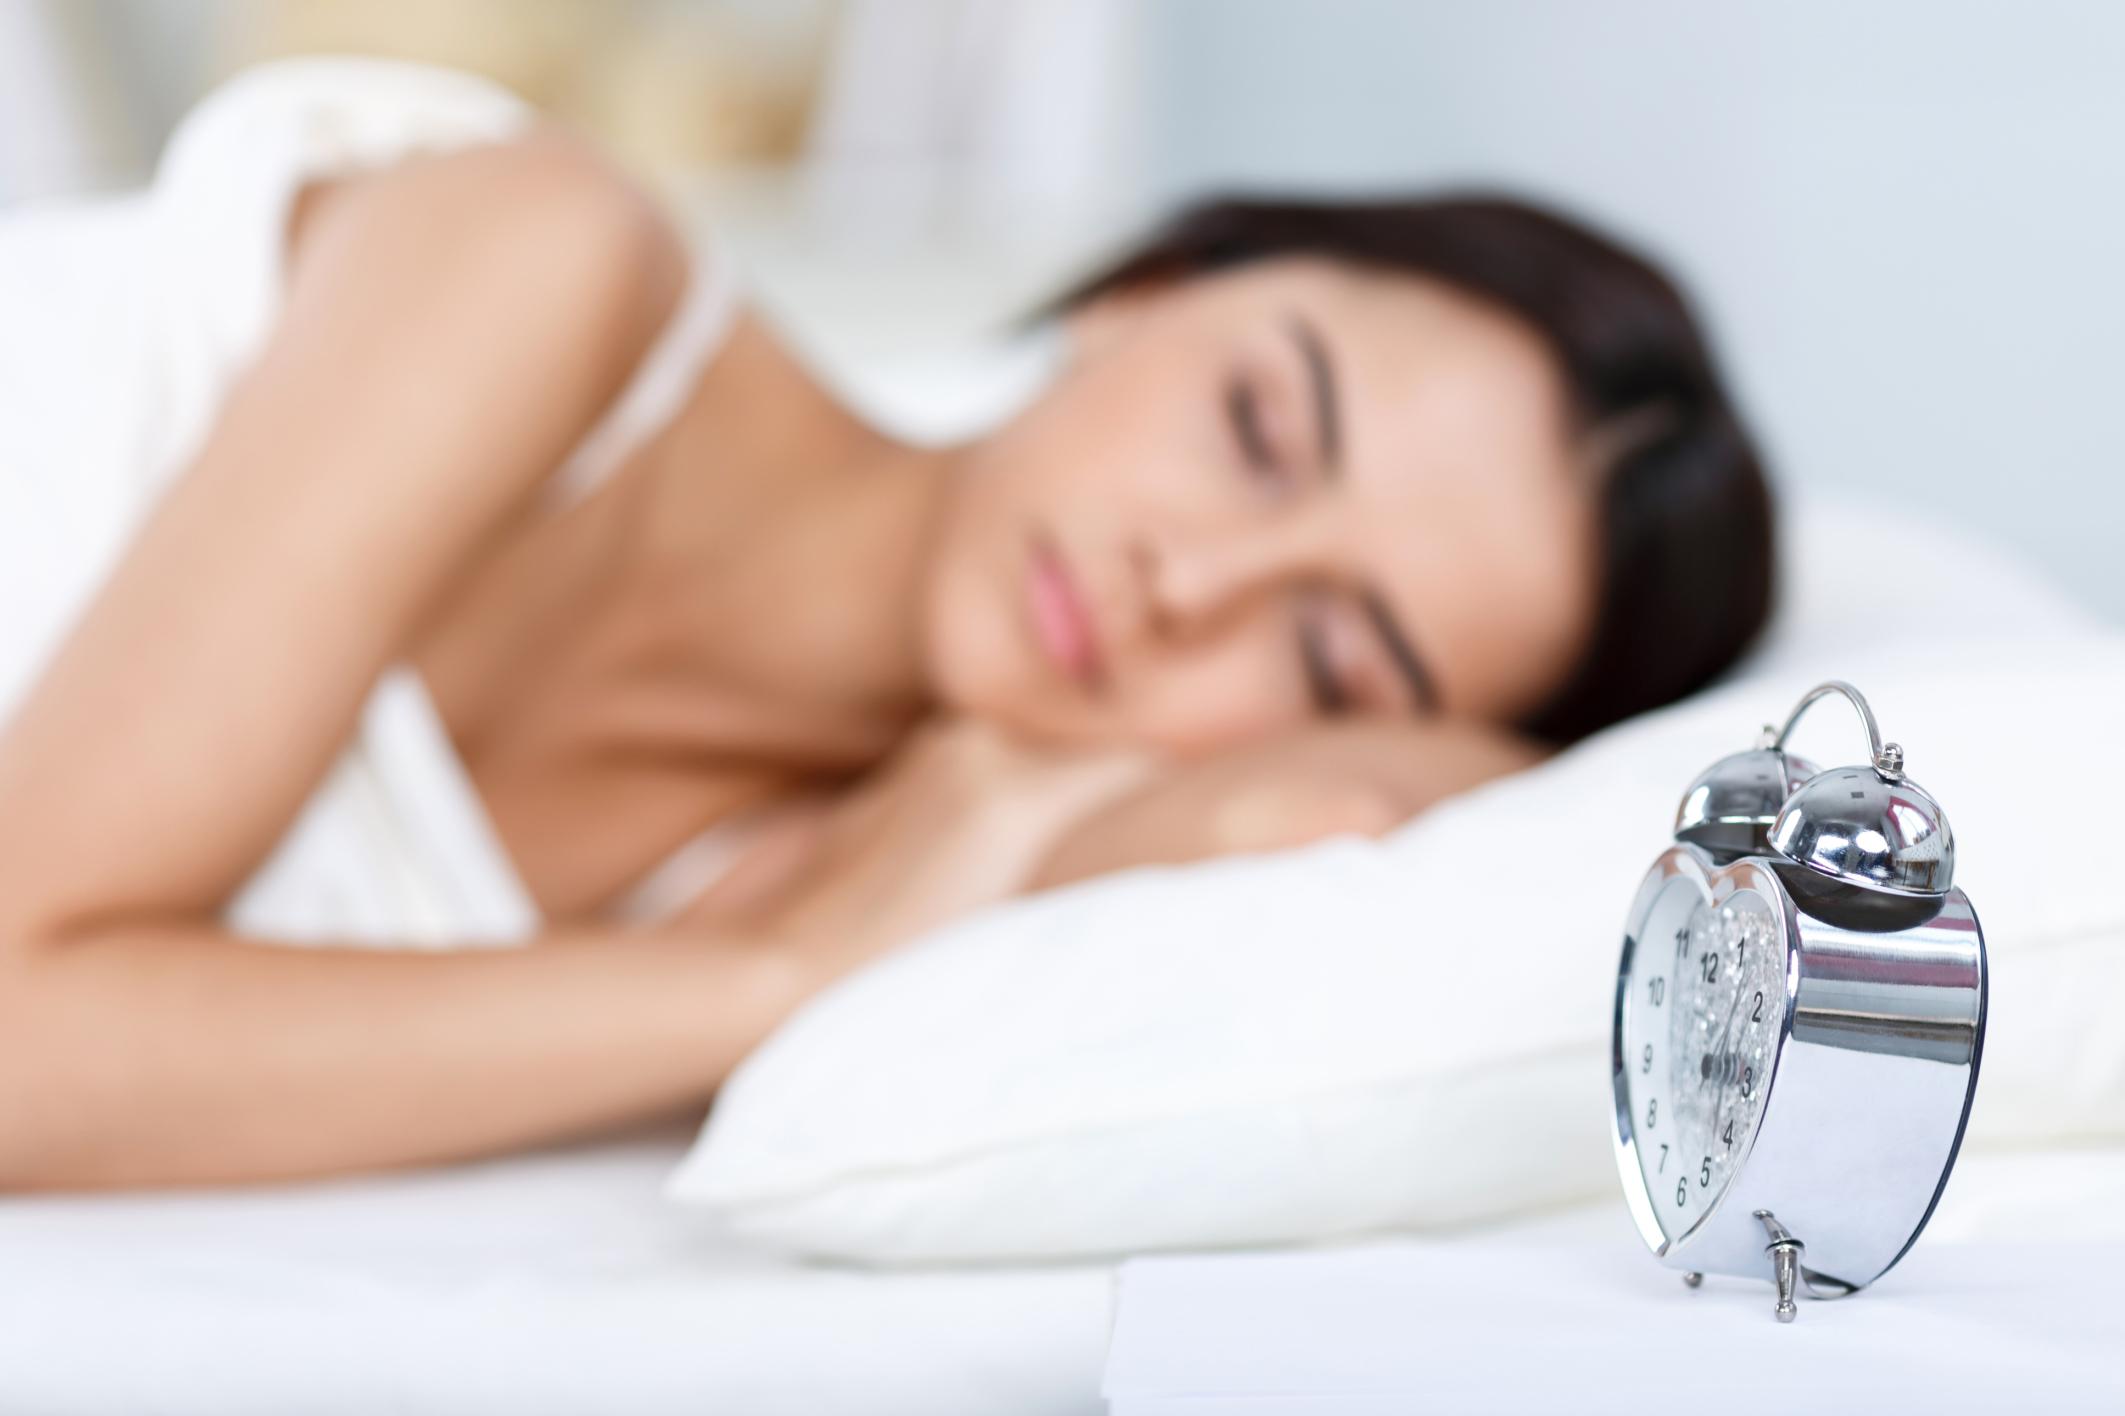 effects of pregabalin on sleep in generalized anxiety disorder